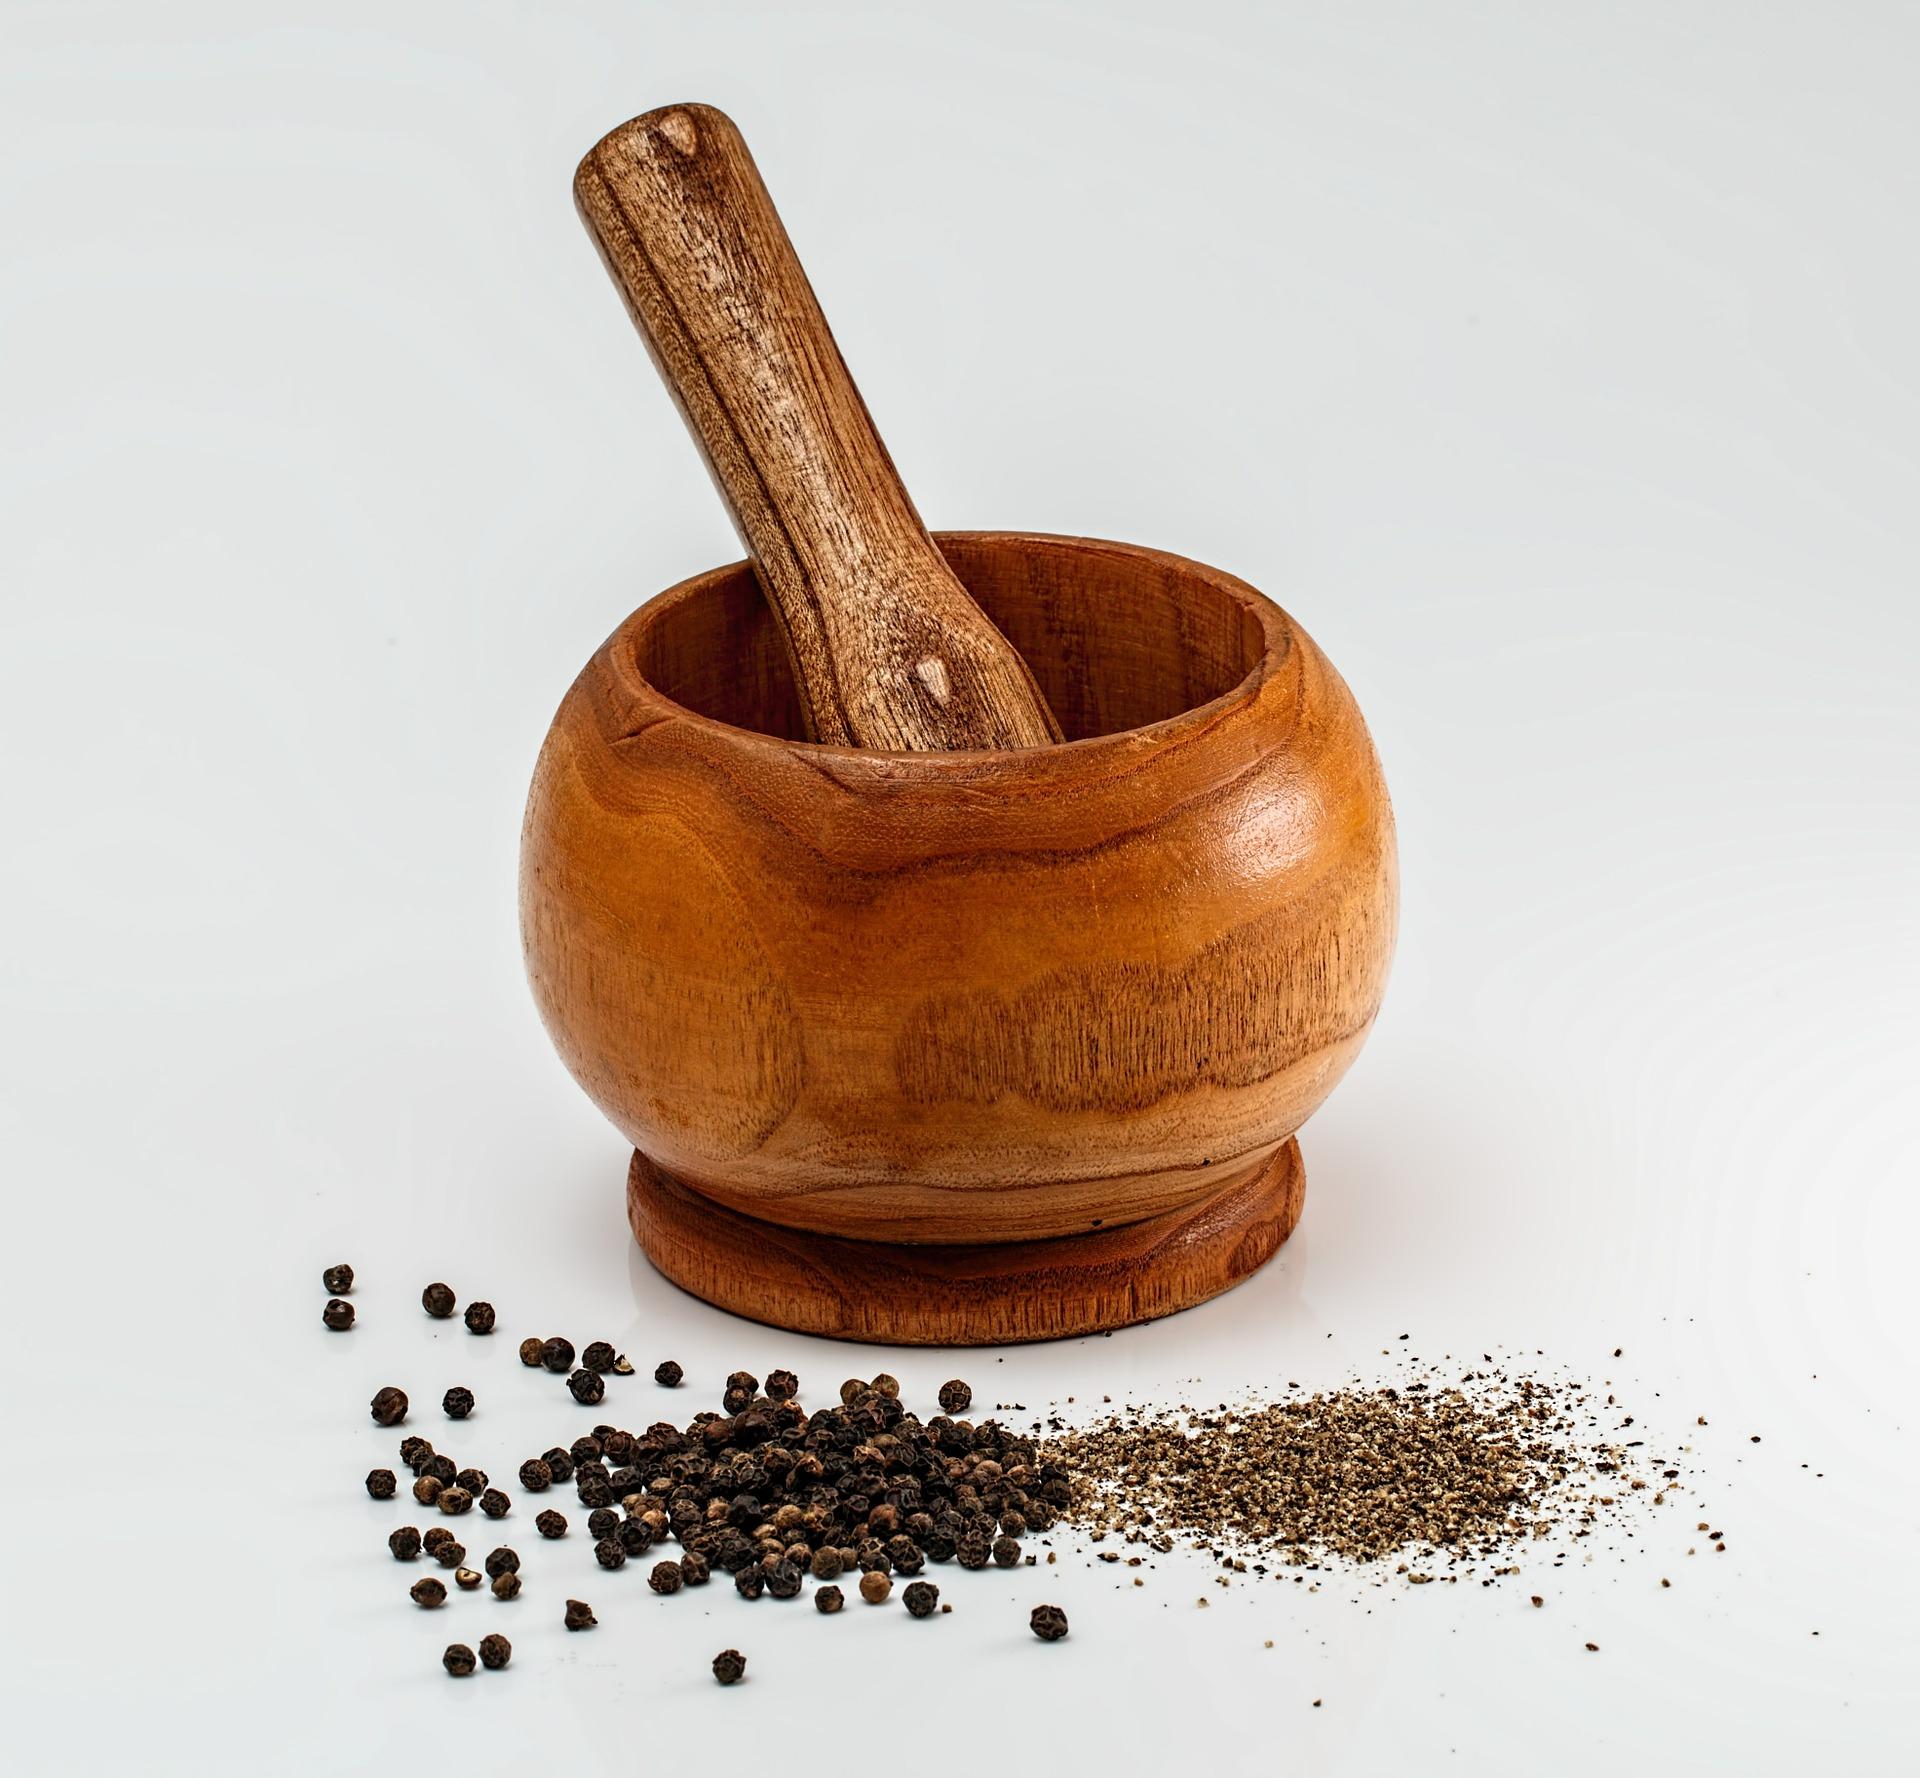 Pepper mortar and pestle